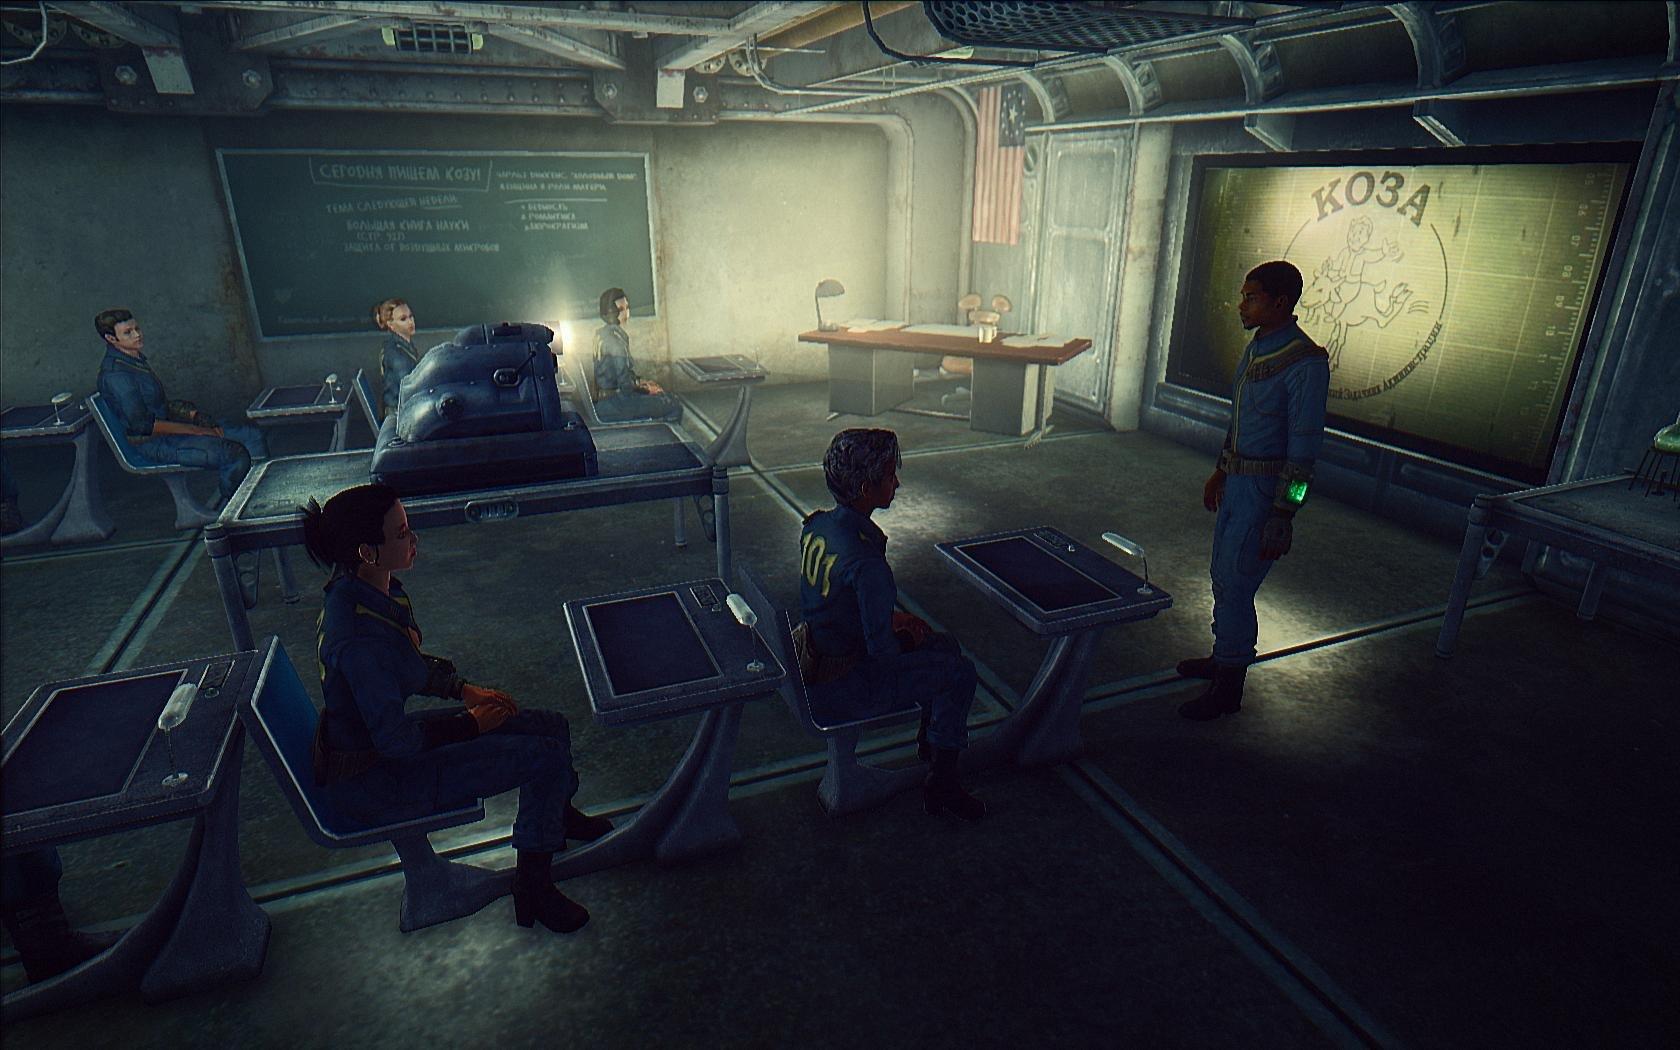 Fallout3 2018-10-01 21-47-34-30.jpg